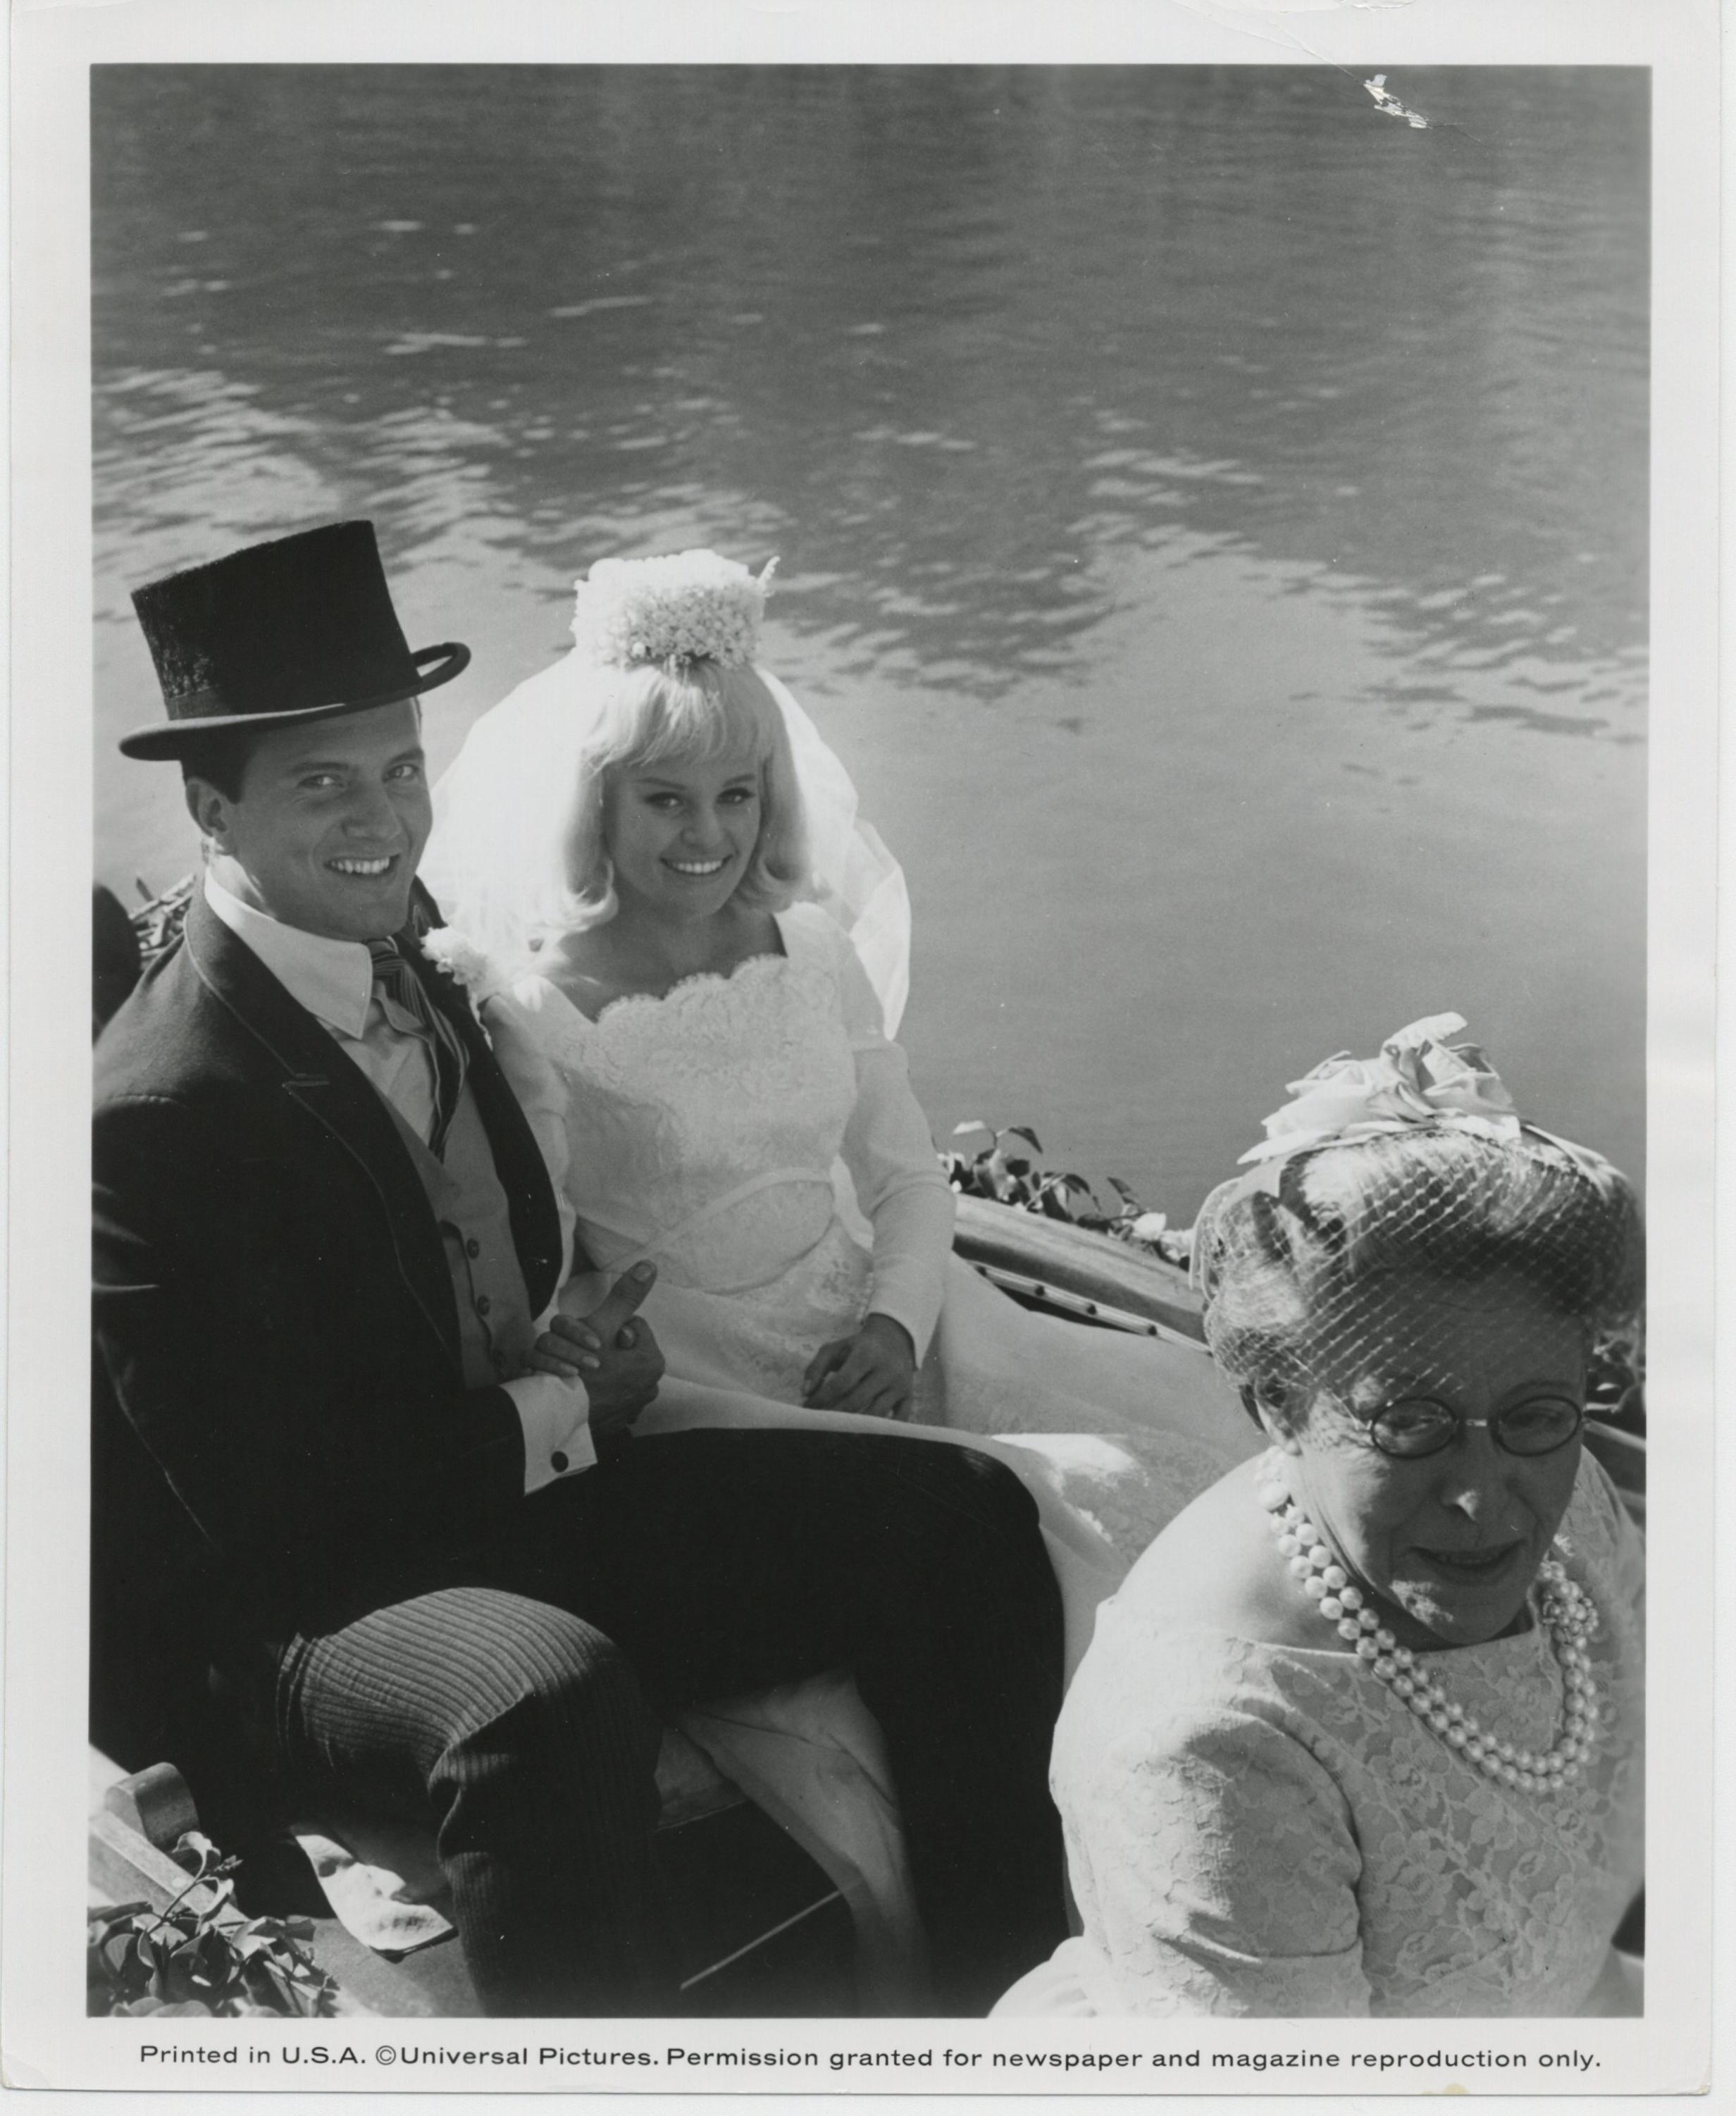 Pat Boone, Pamela Austin, and Doris Packer in The Perils of Pauline (1967)